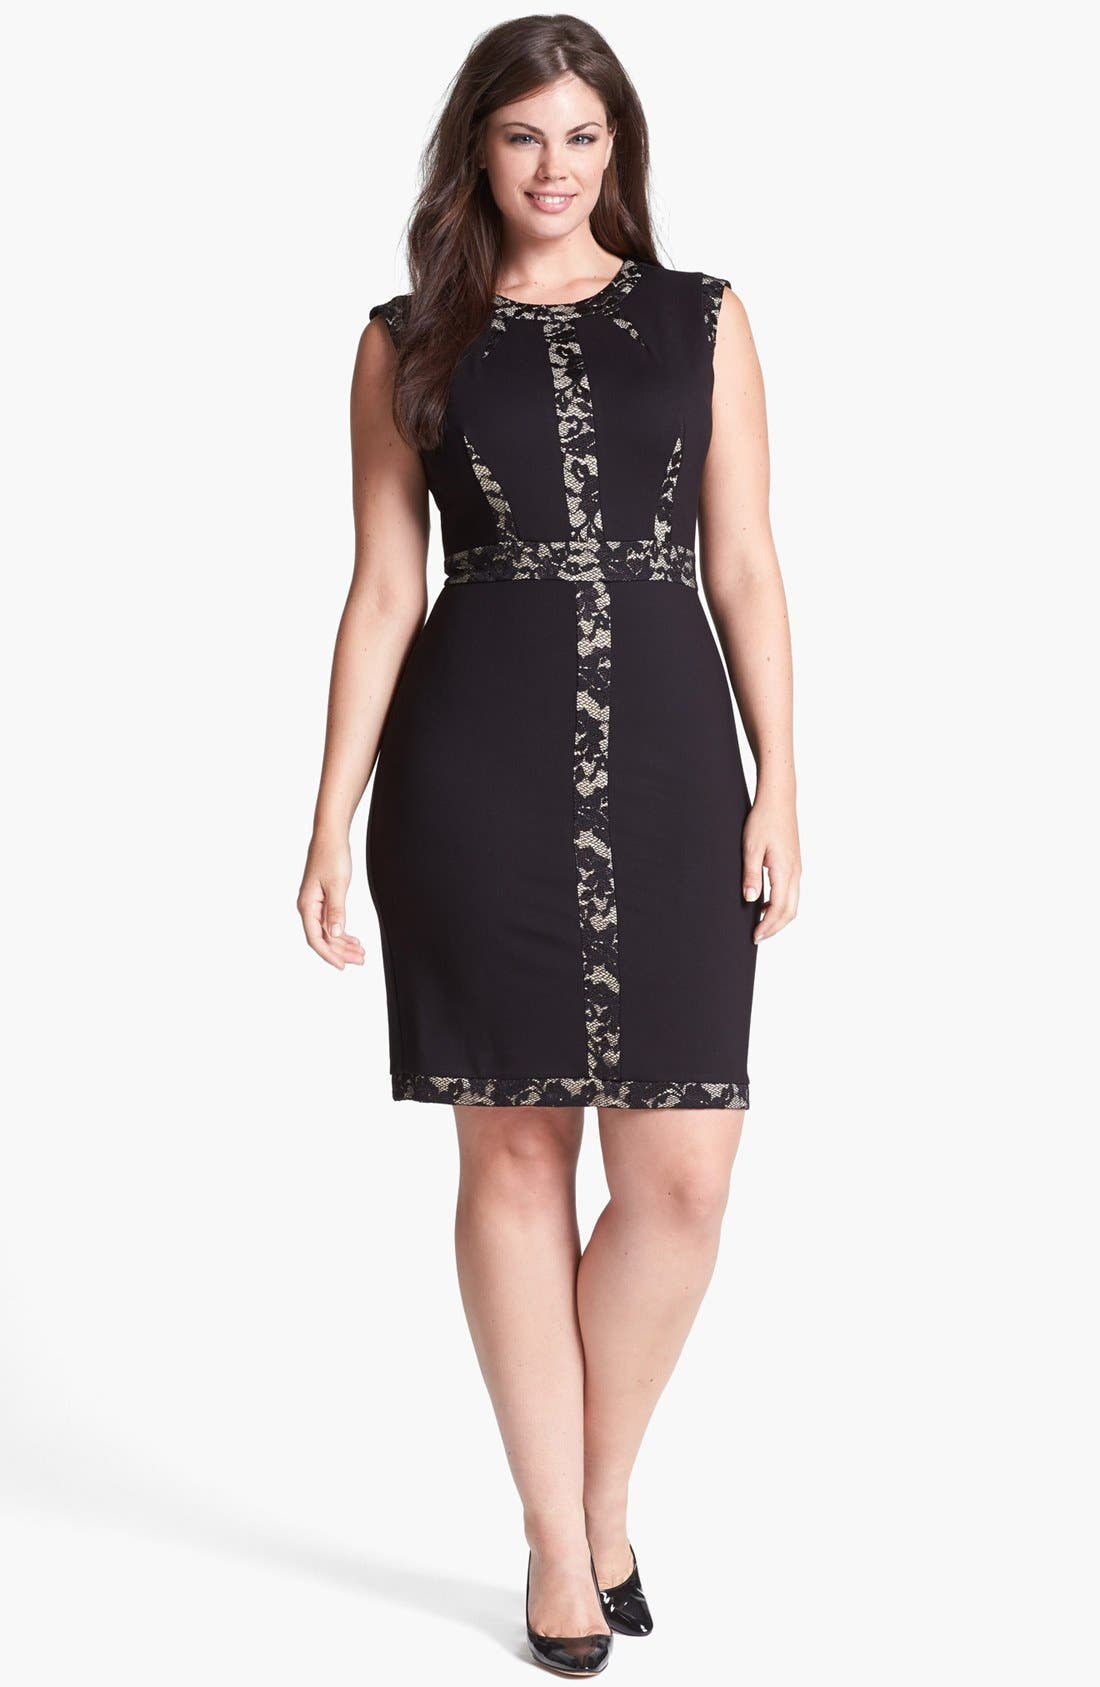 Main Image - ABS by Allen Schwartz Lace Block Sheath Dress (Plus Size)